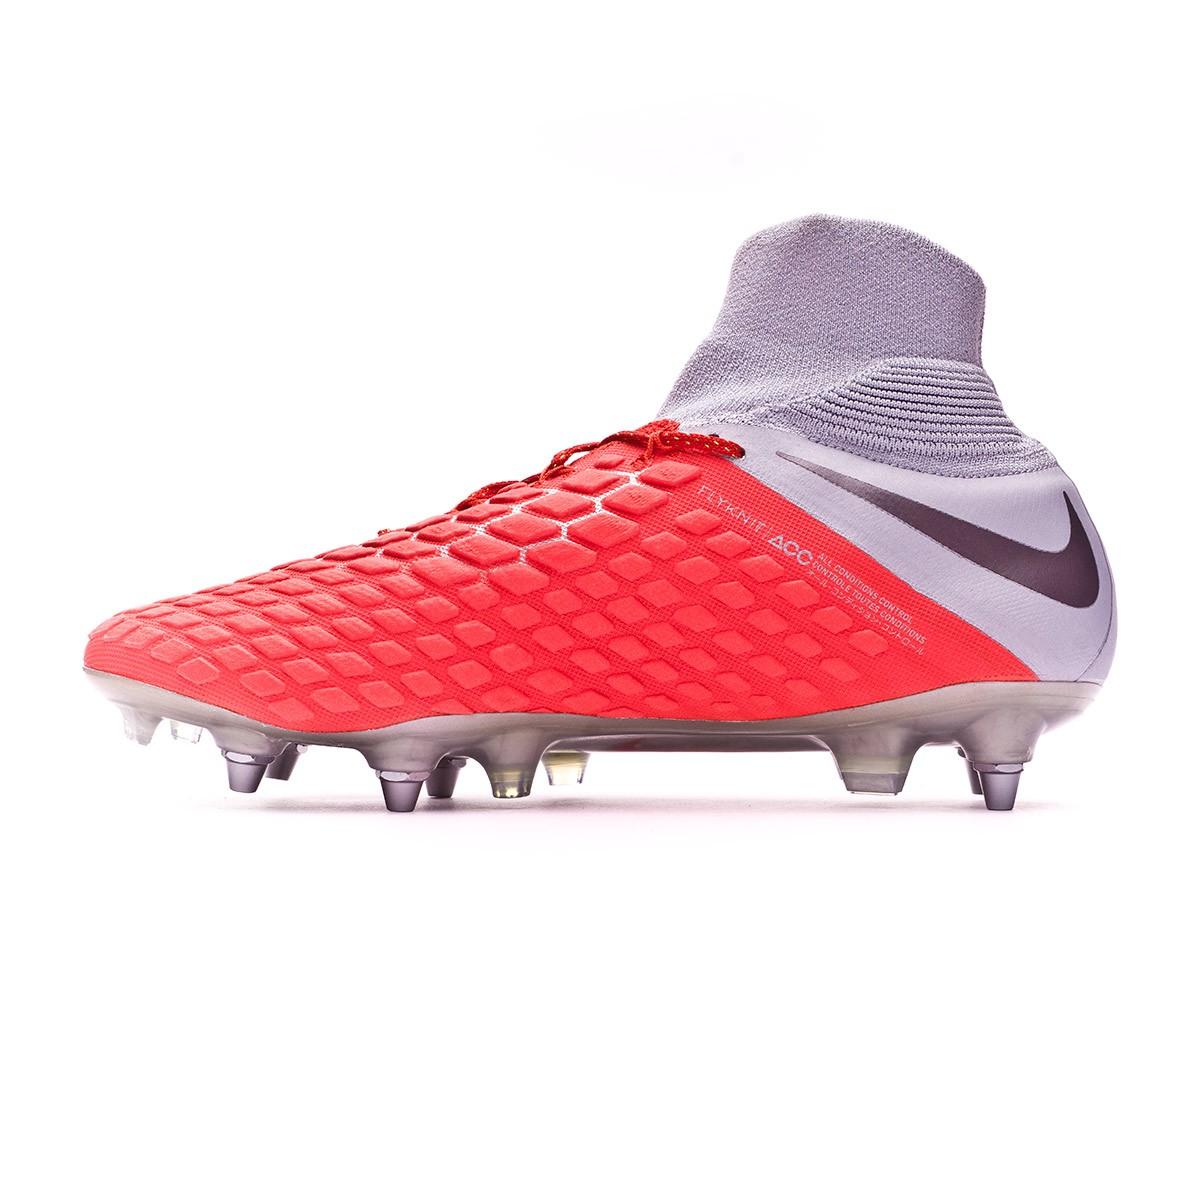 d9fbe76c4 Football Boots Nike Hypervenom Phantom III Elite DF Anti-Clog SG-Pro Light  crimson-Metallic dark grey-Wolf grey - Football store Fútbol Emotion